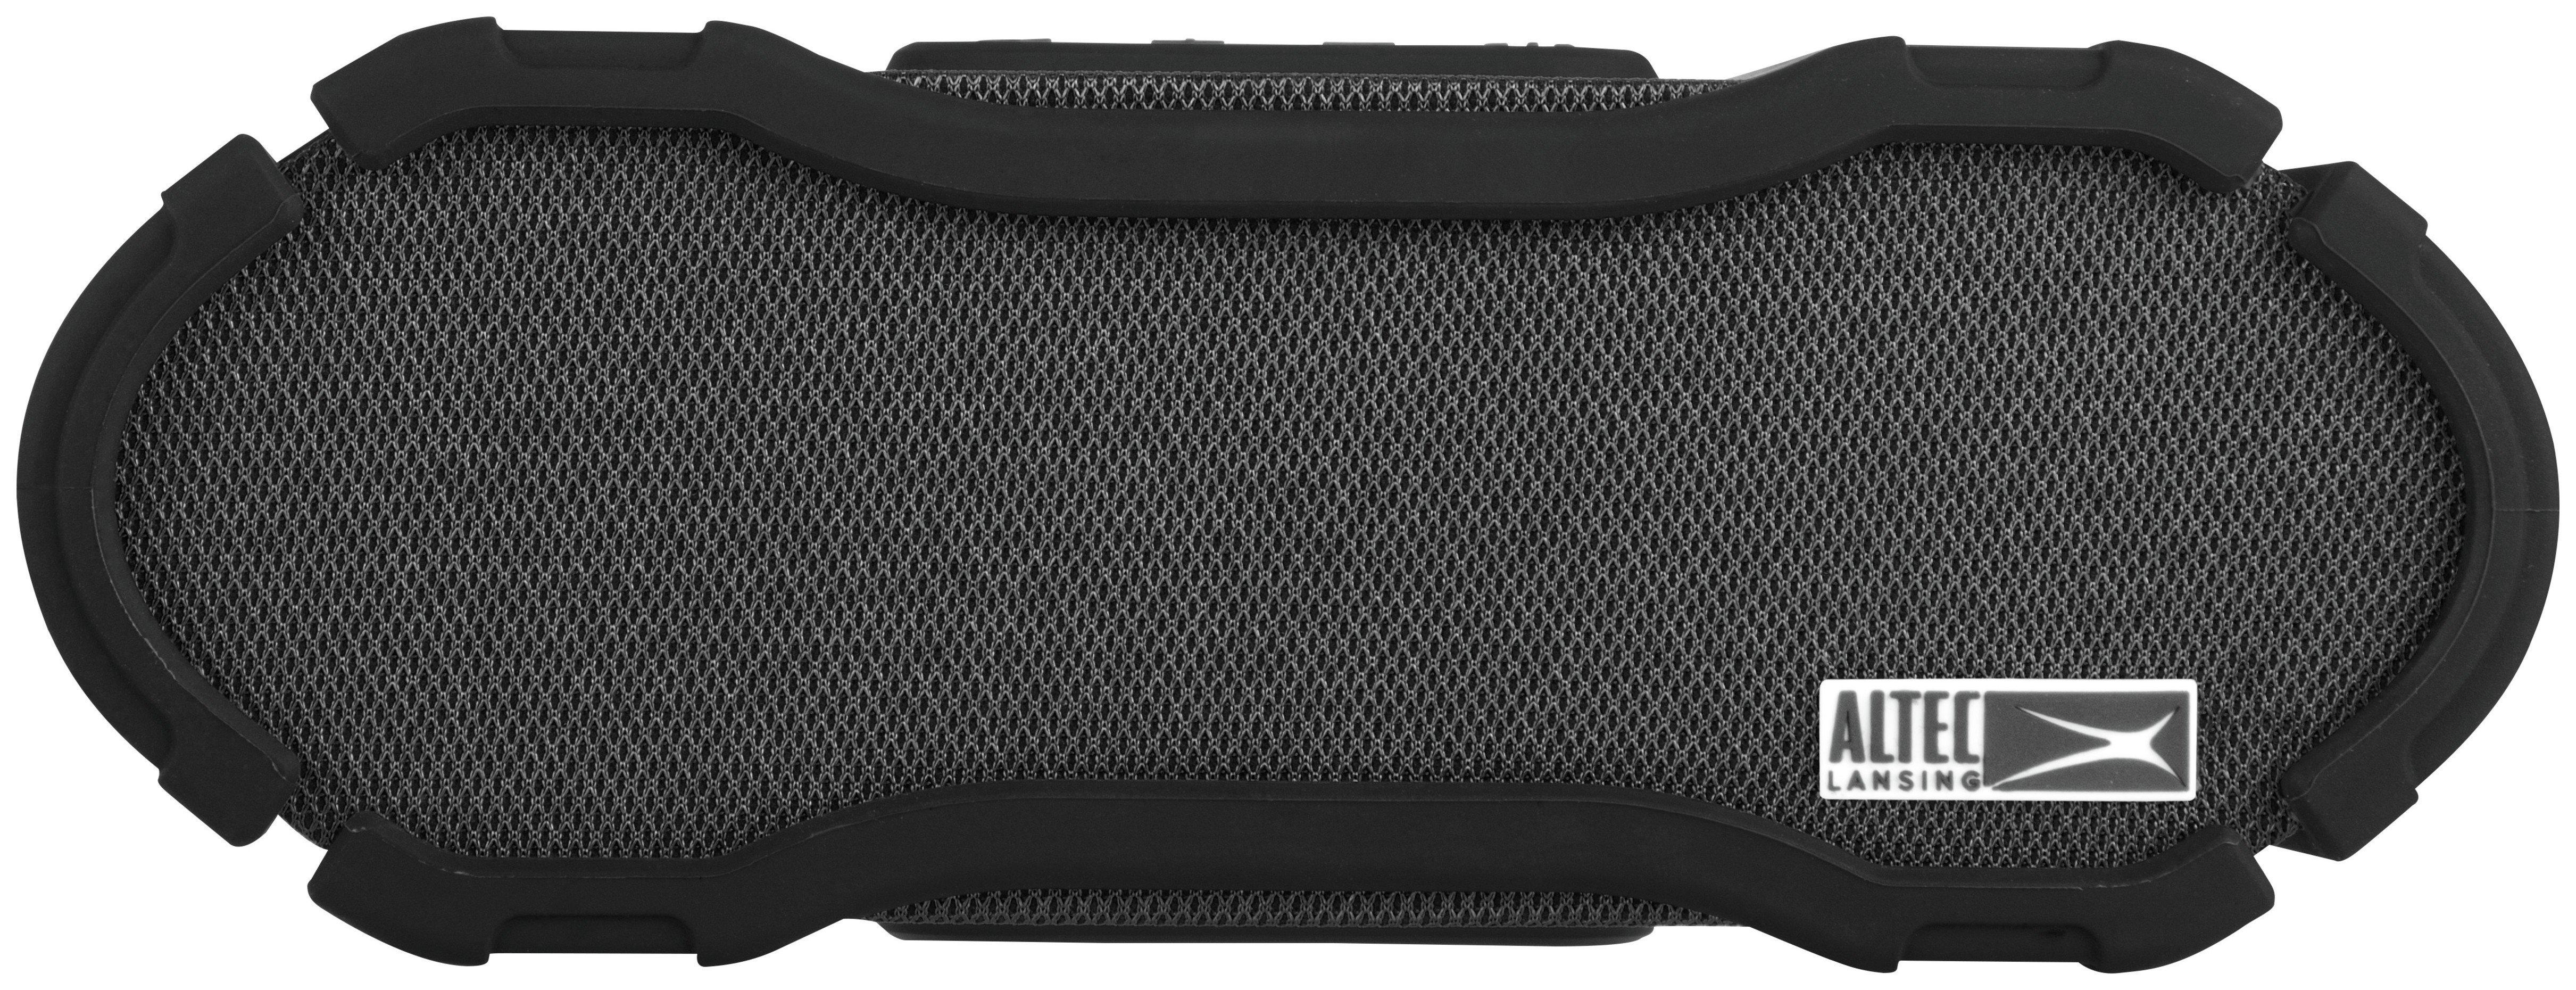 Altec Mini Boom Jacket Portable Wireless Speaker - Black.